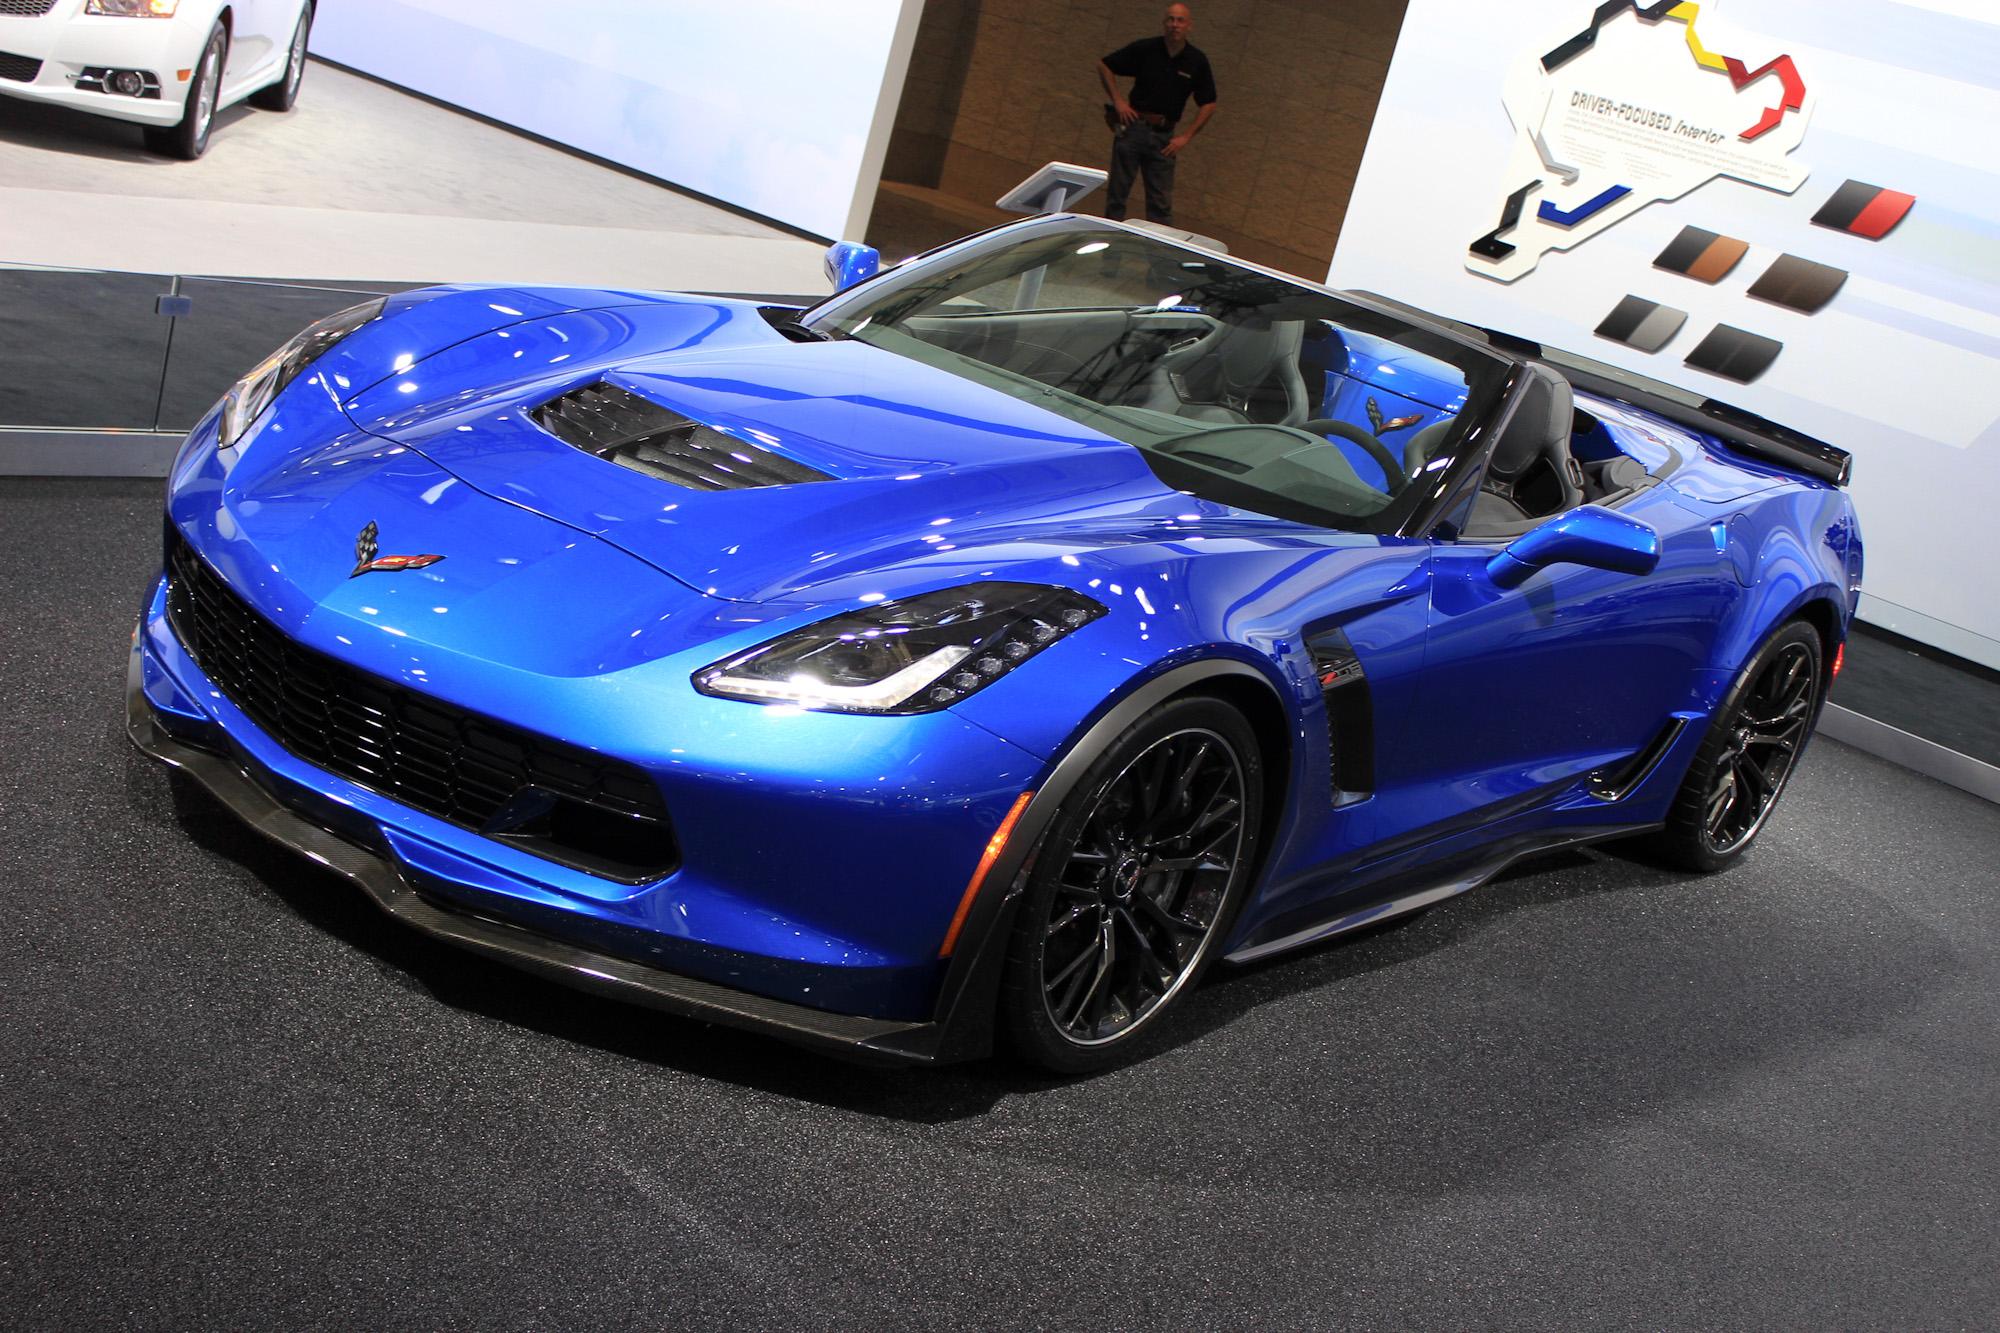 2017 Corvette Z06 2016 Discovery Sport New Infiniti Concept Today S Car News